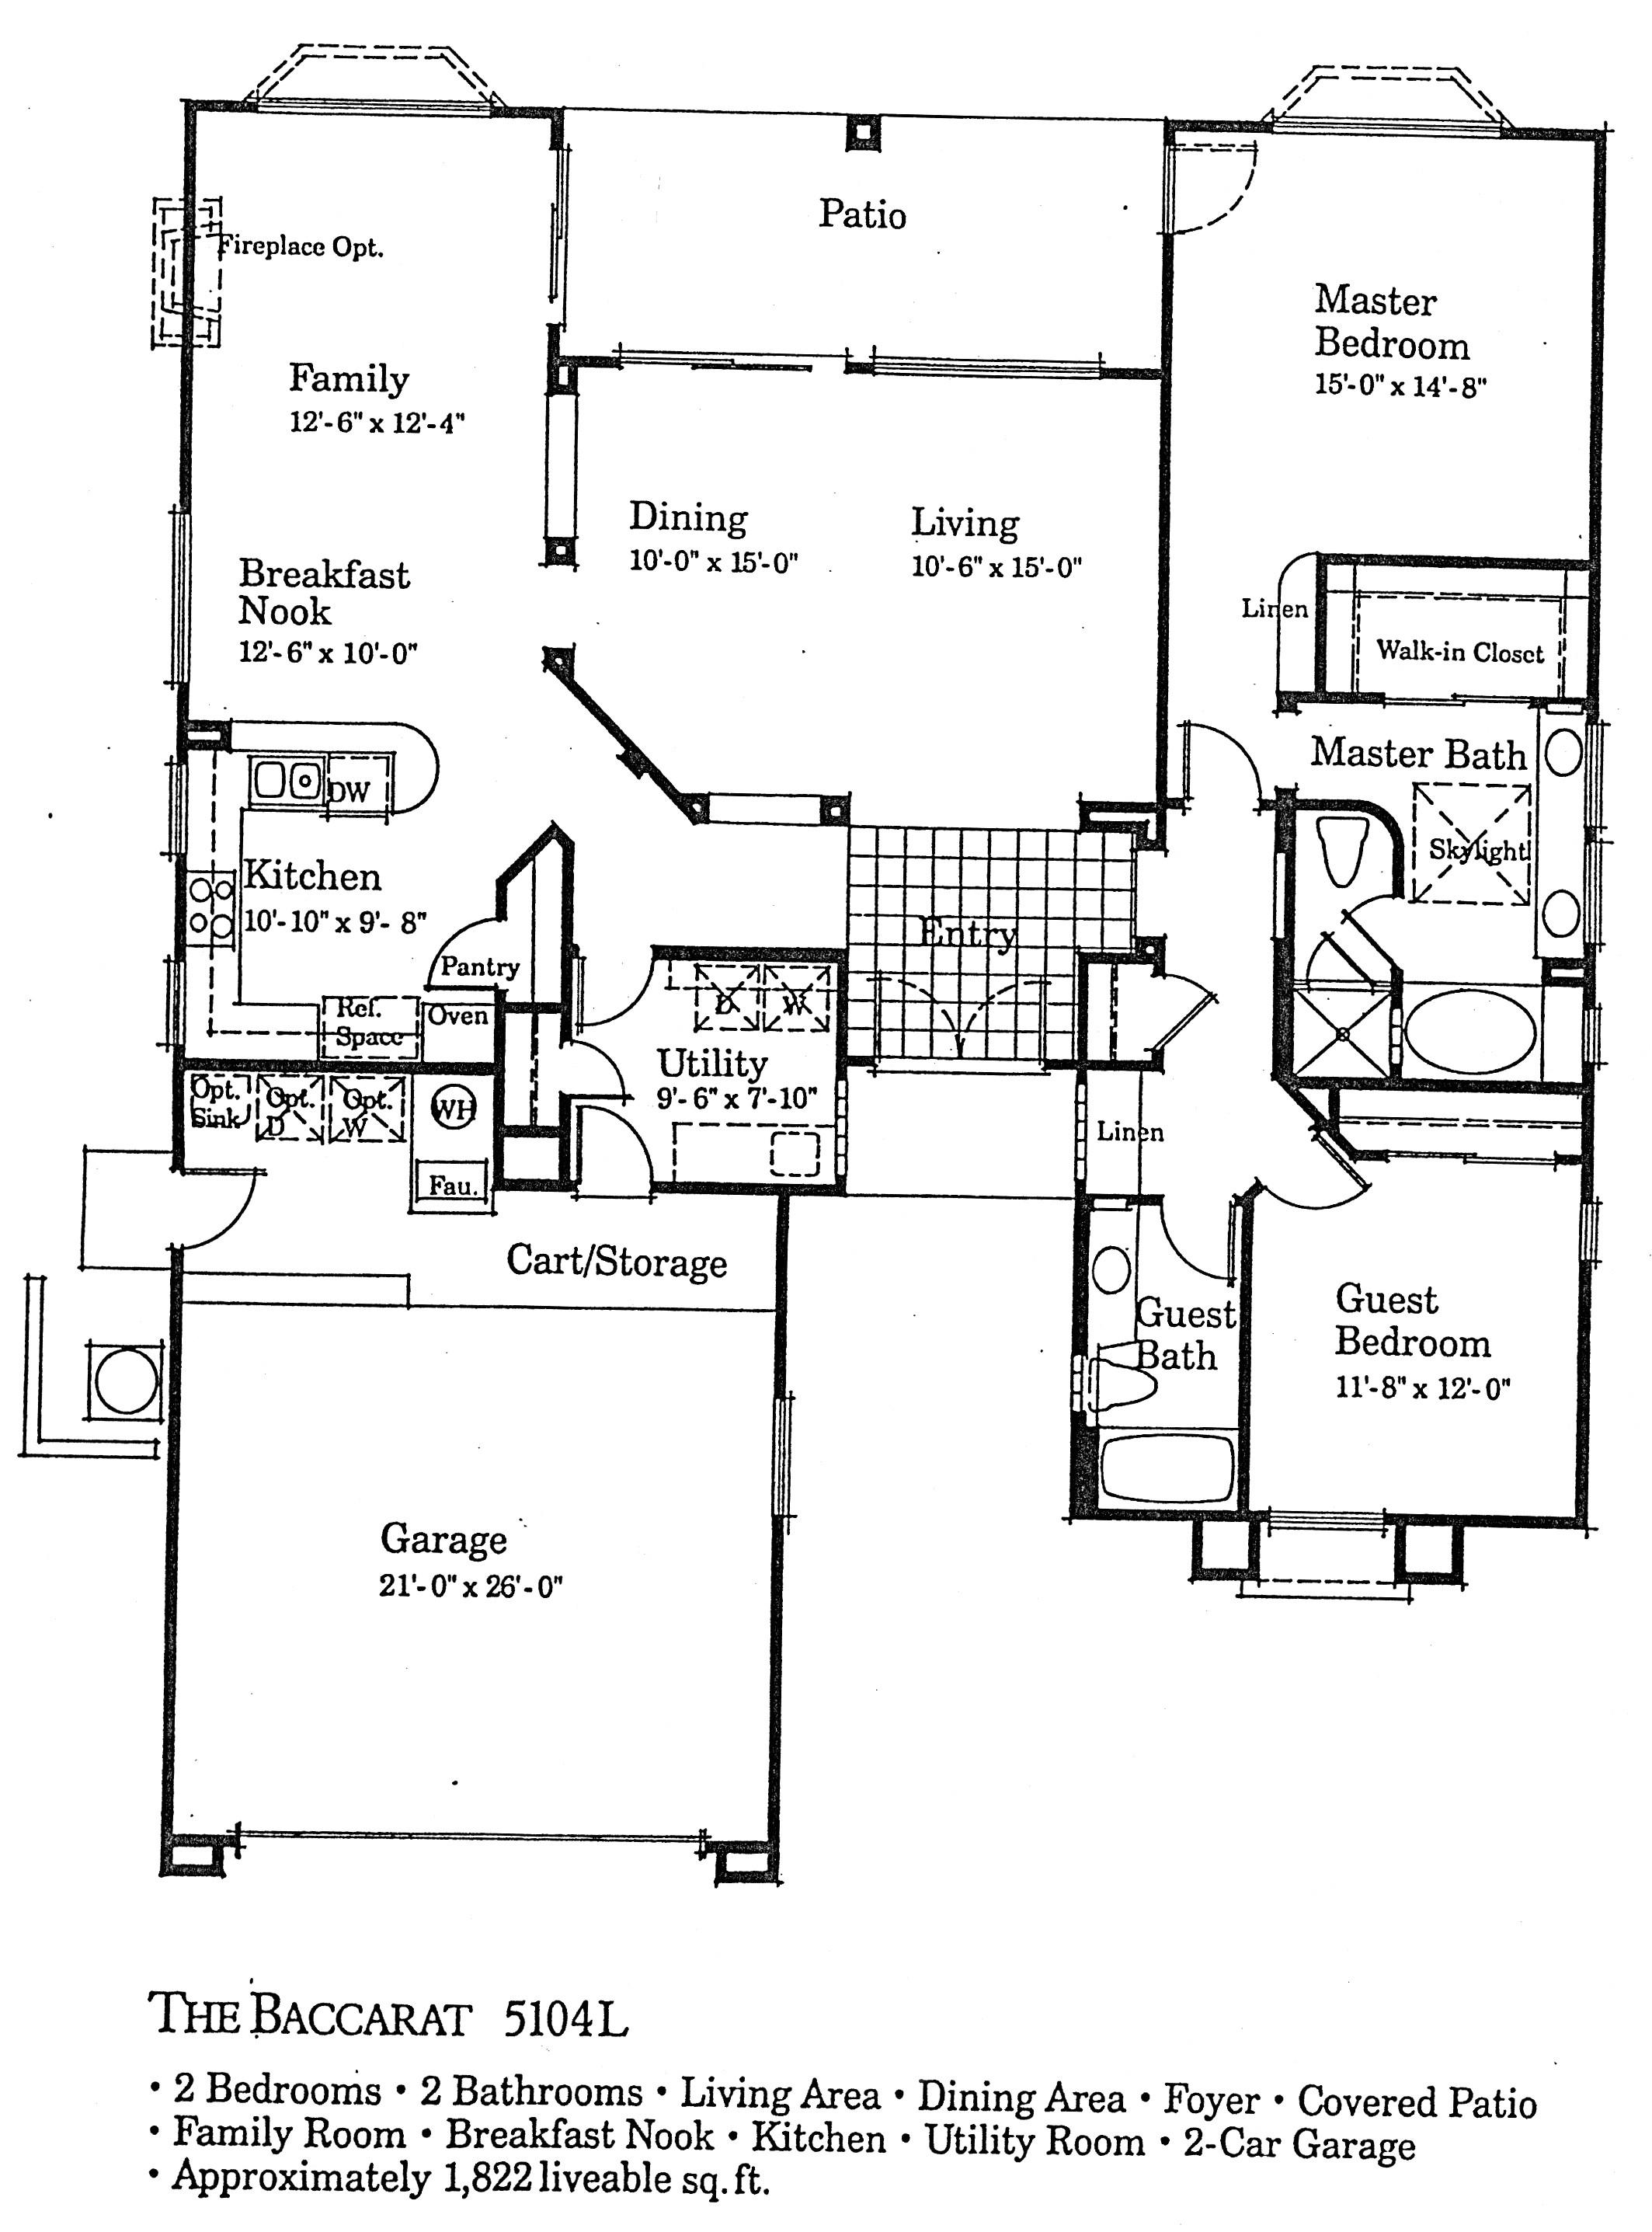 hulbert homes floor plans beautiful divosta homes floor plans simple open floor plan homes